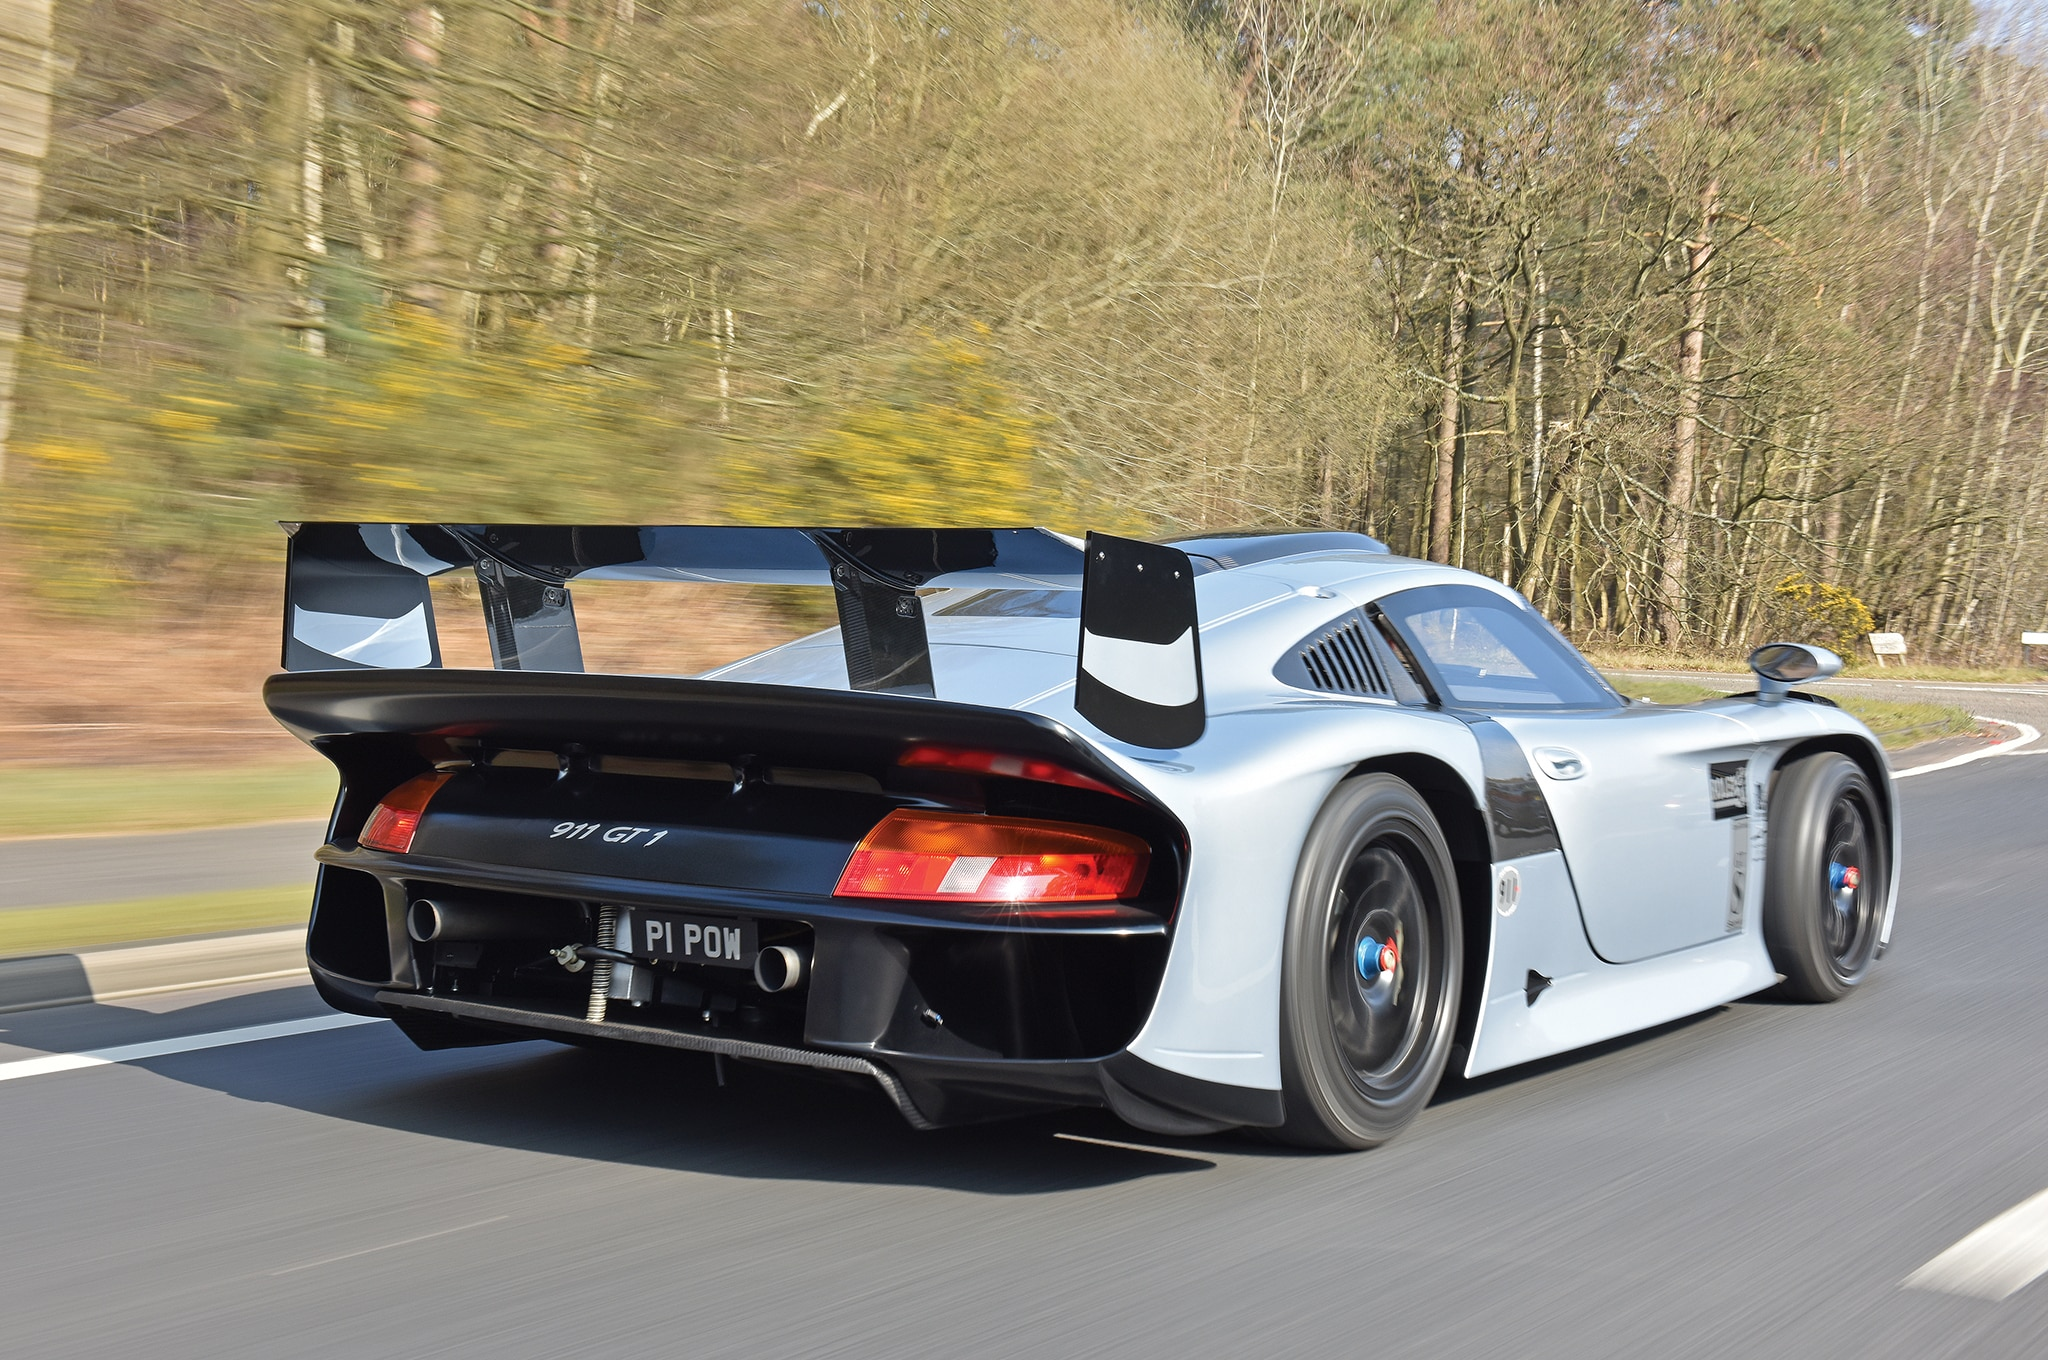 The Only Street-Legal 1997 Porsche 911 GT1 Evo Heads to